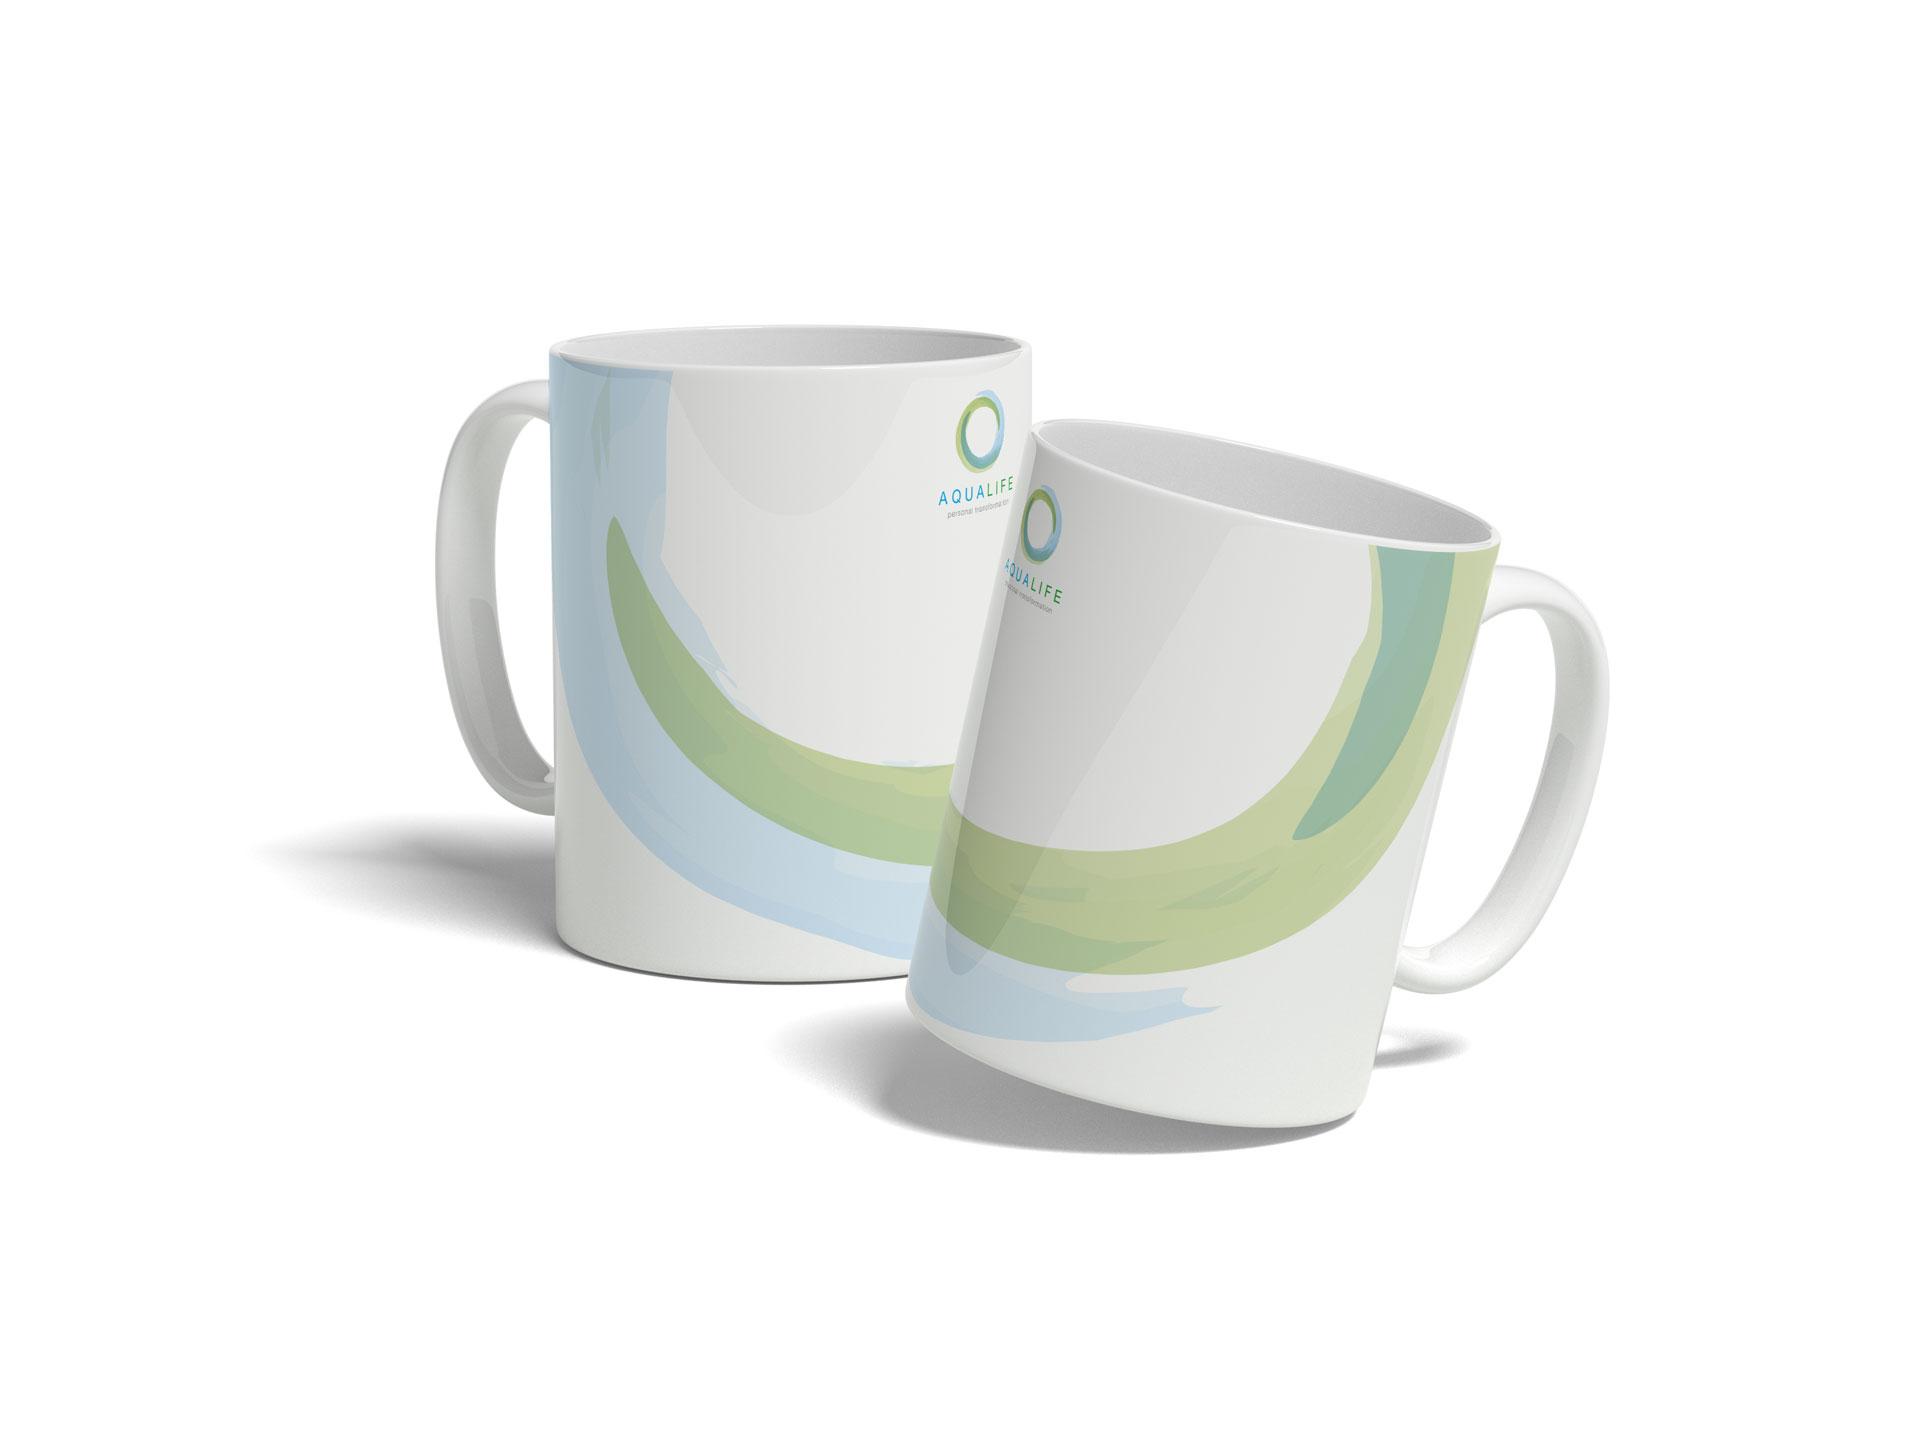 aqualife-mug2